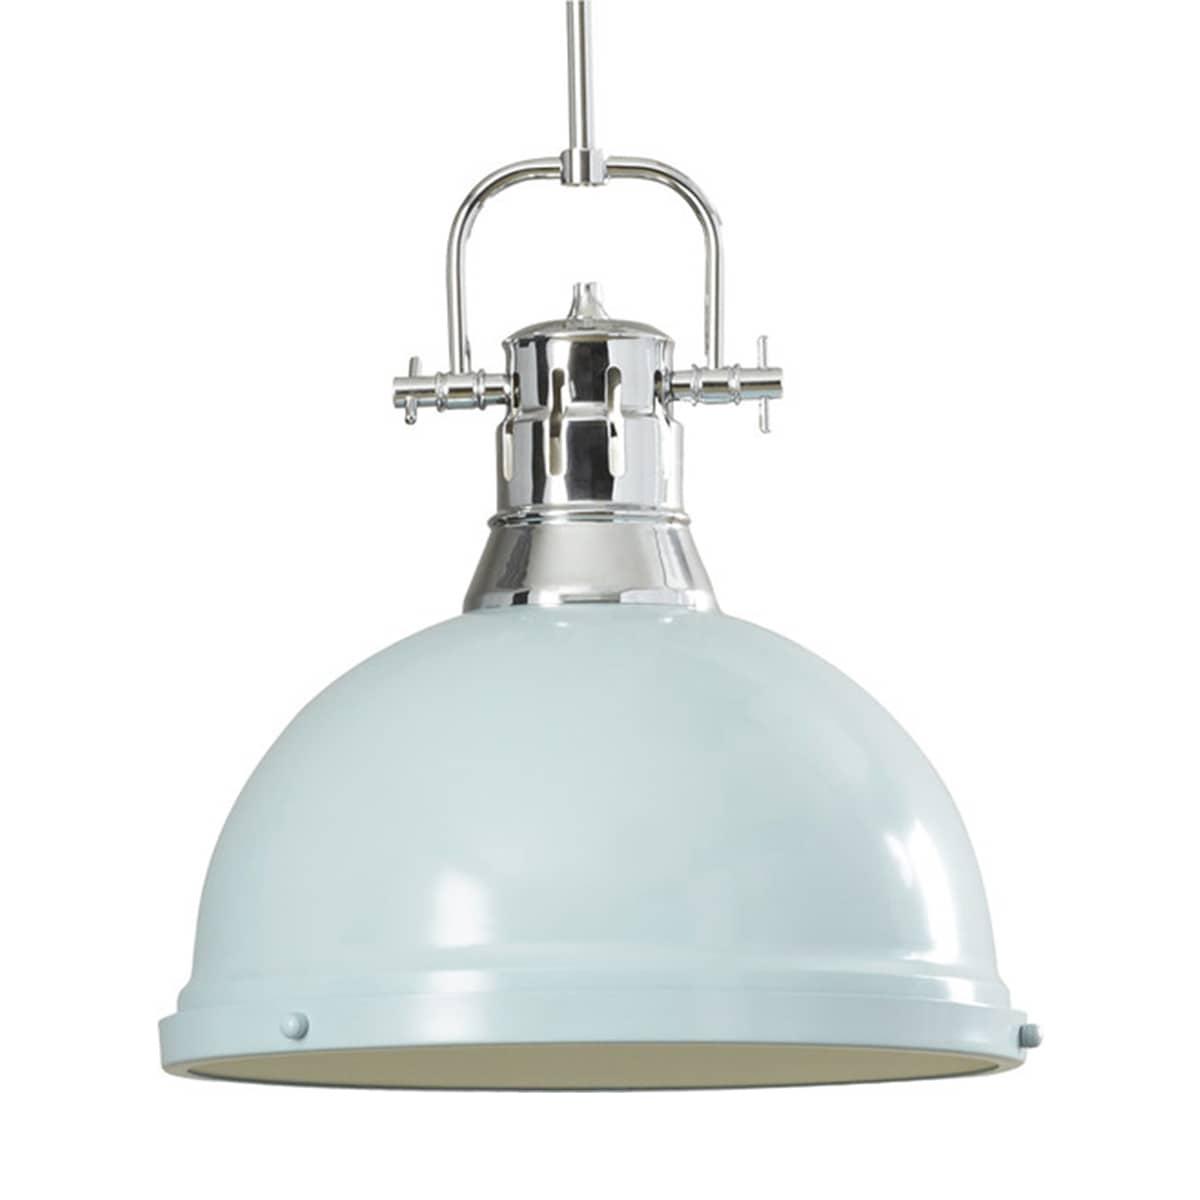 10 Budget-Friendly Kitchen Pendant Lights: gallery image 10